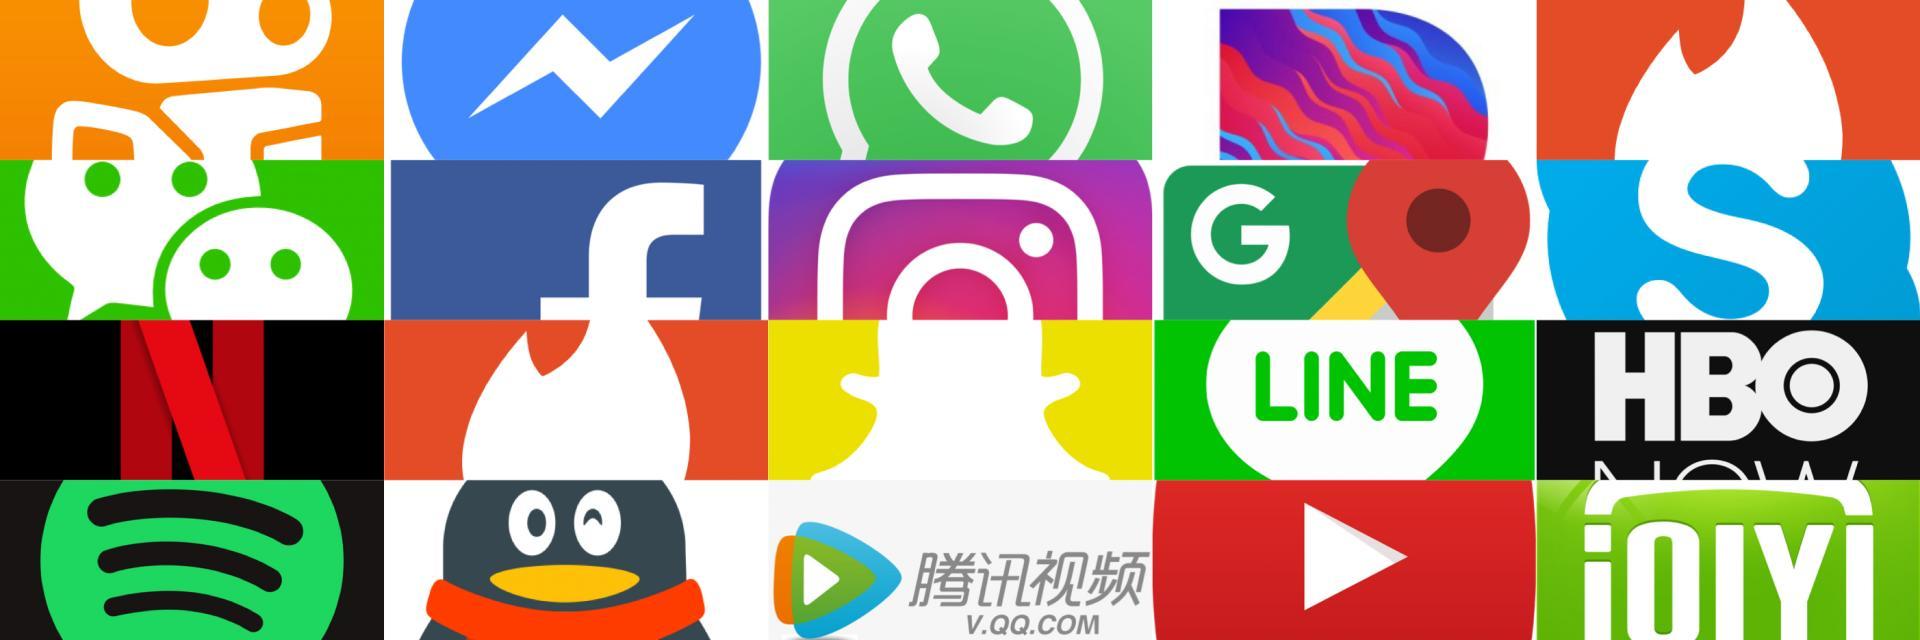 Top mobile incontri Apps 2016